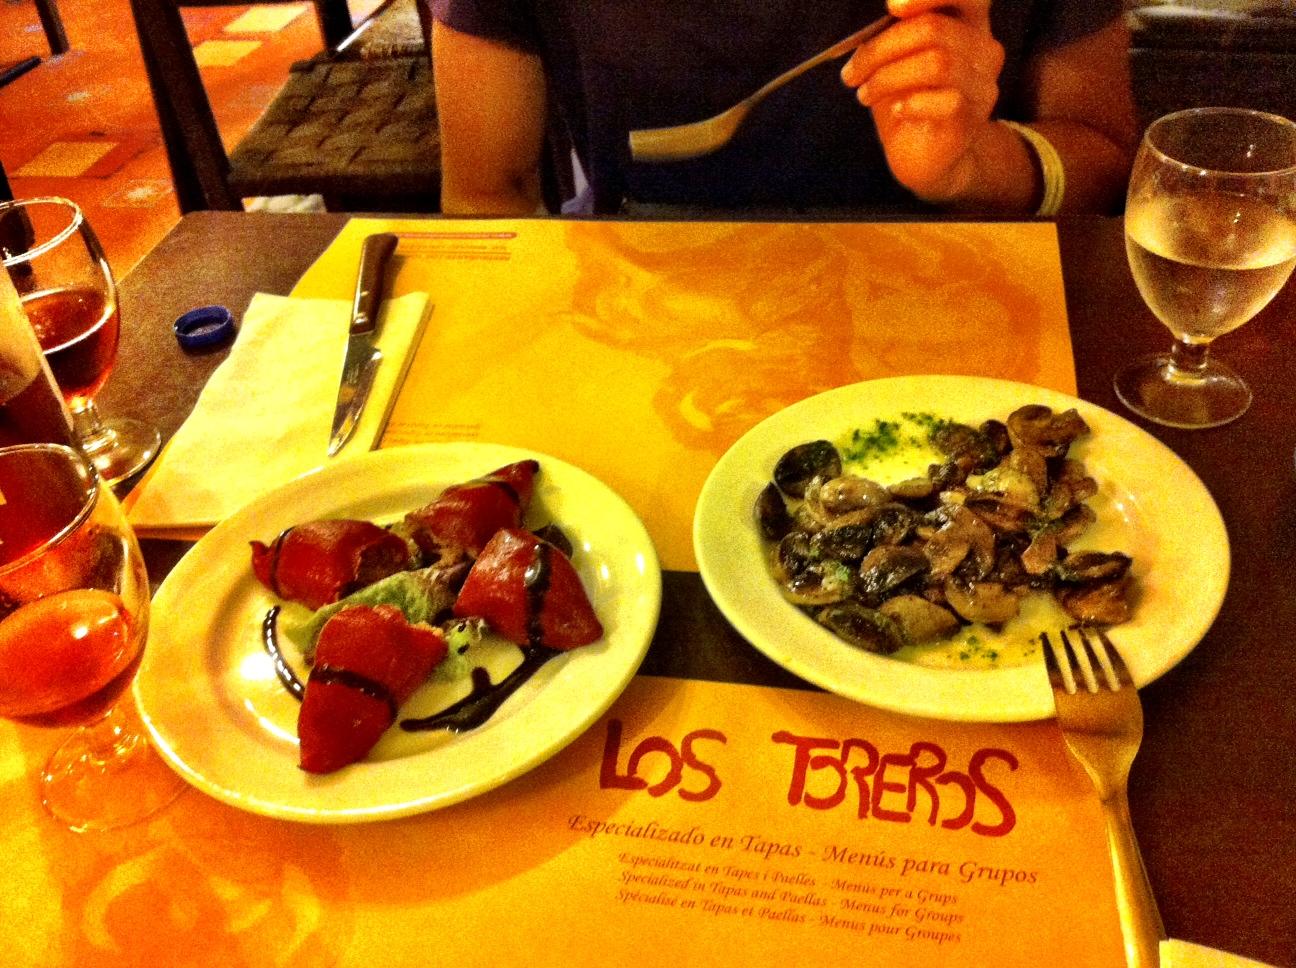 los-toreros-barcelona-tapas-restaurant-review